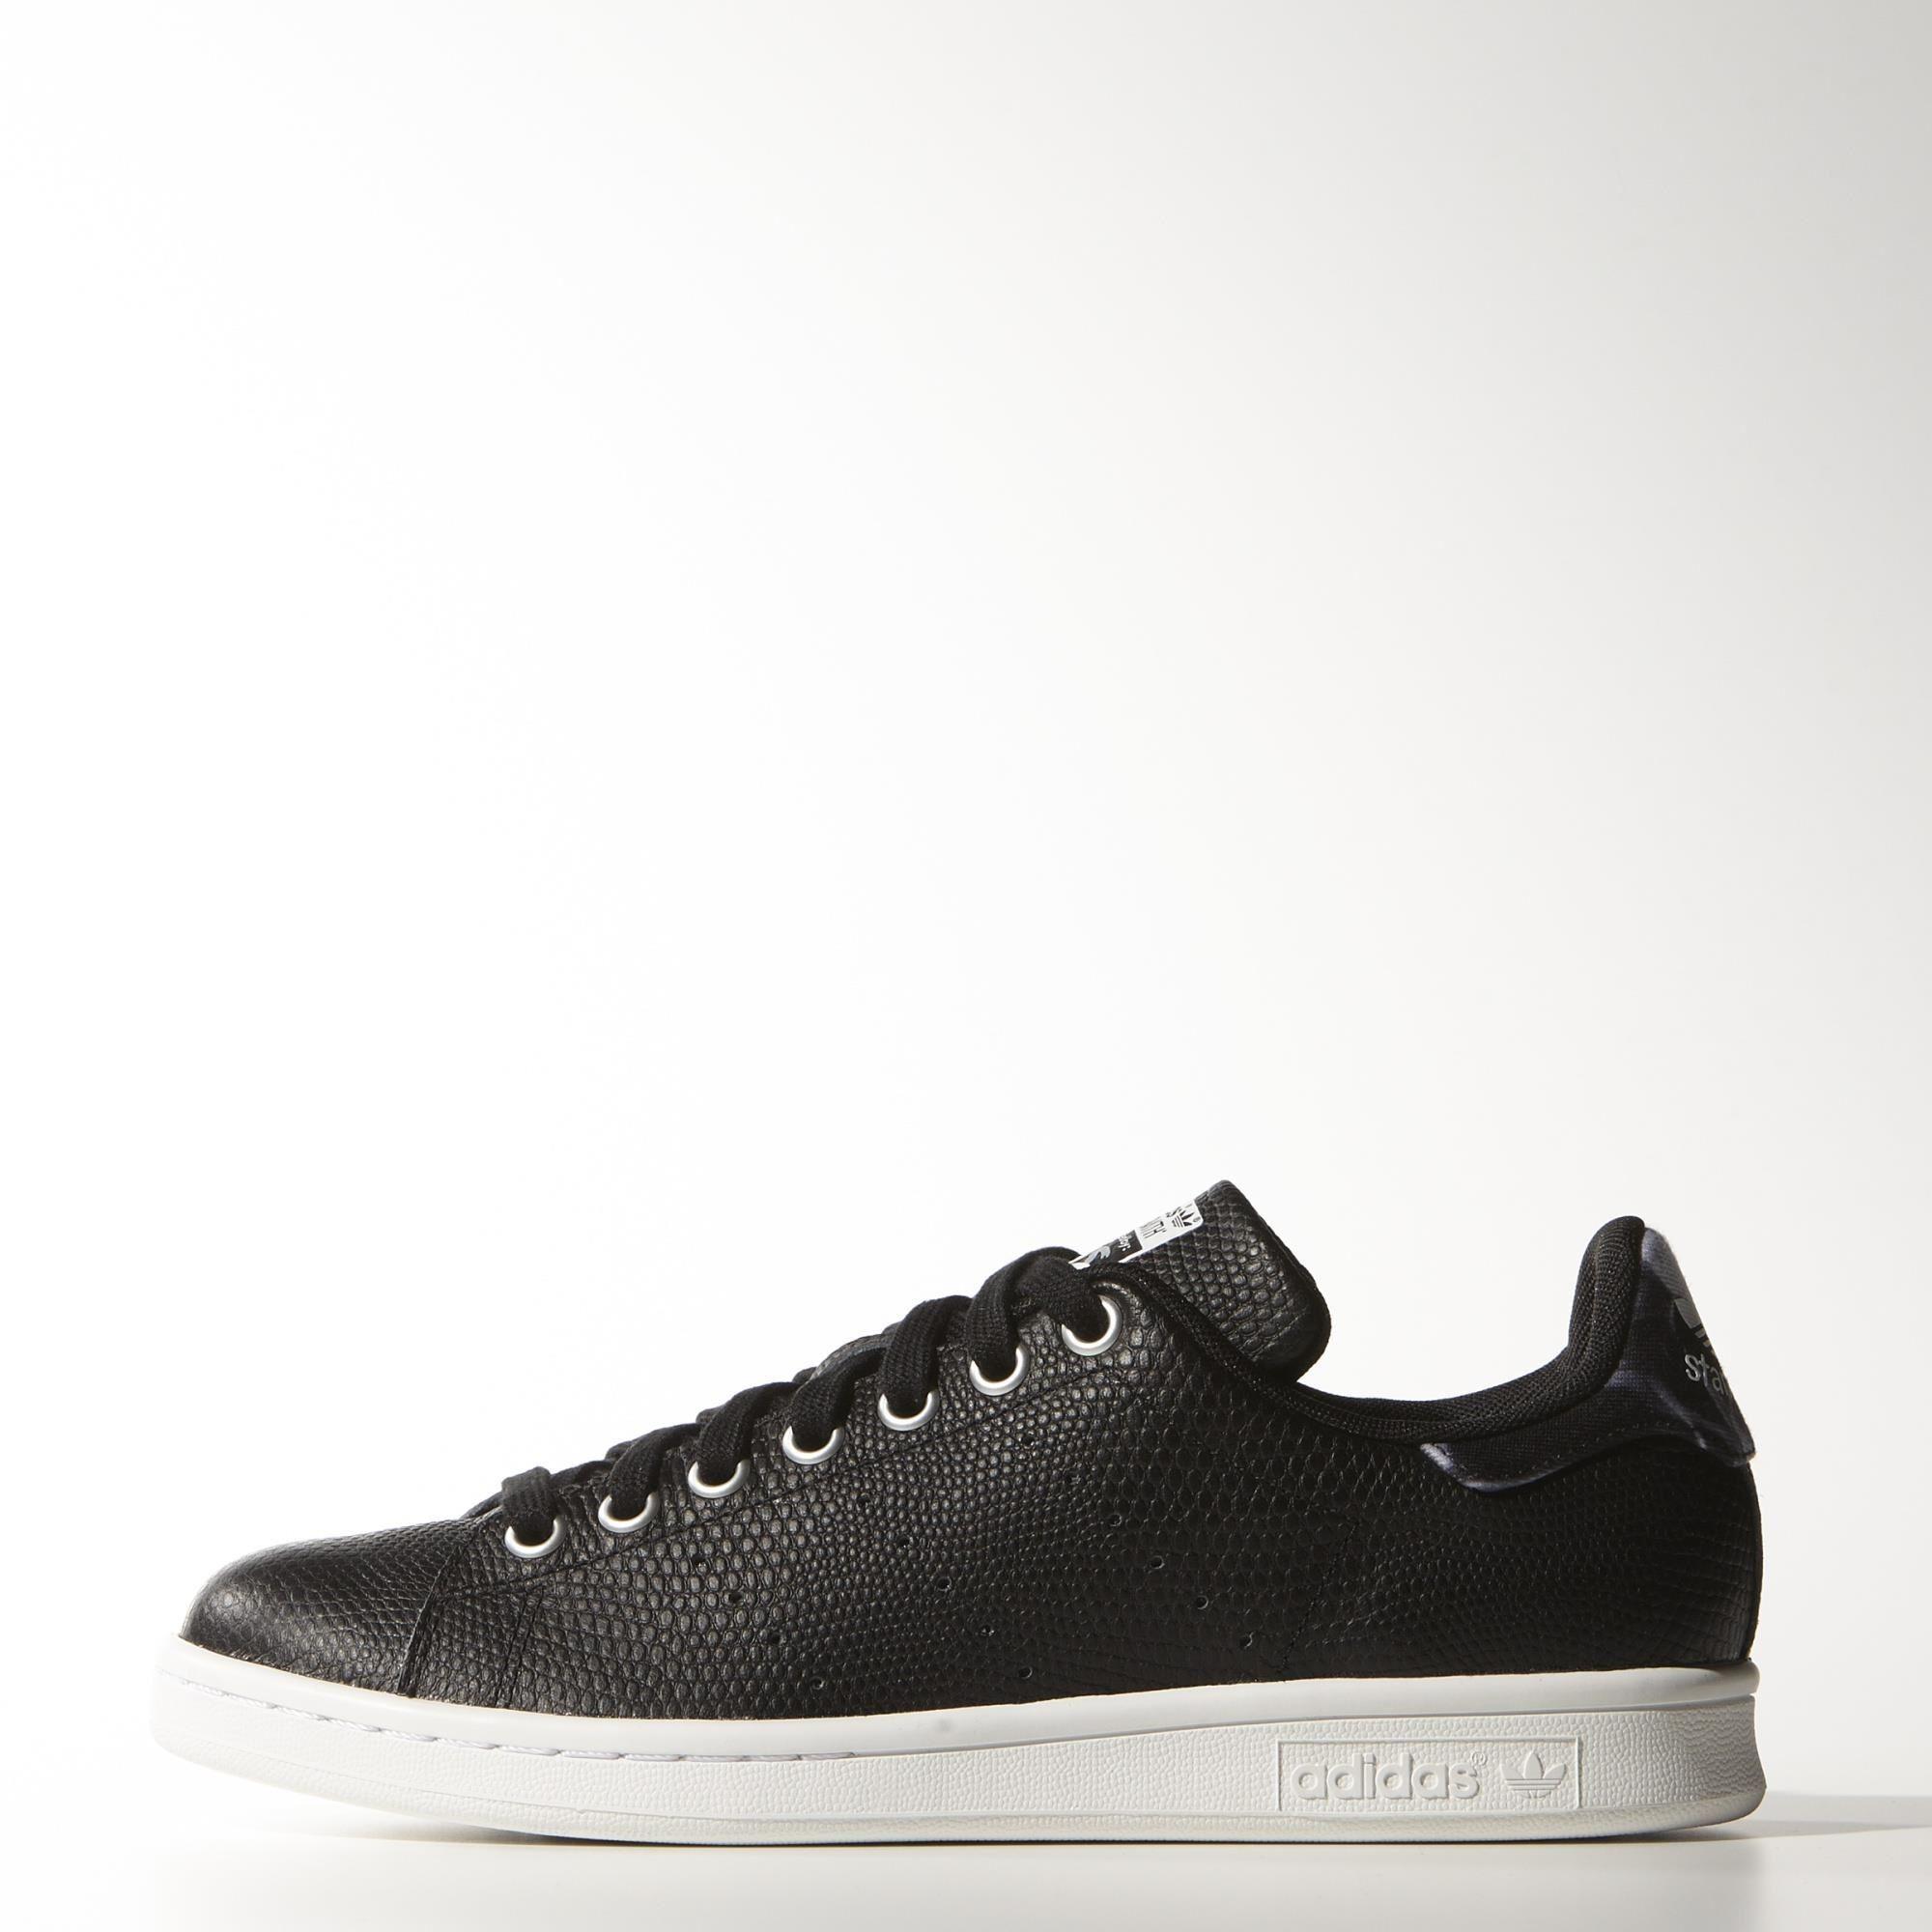 a0d9894af1207 adidas Women s Rita Ora Stan Smith Shoes - Black